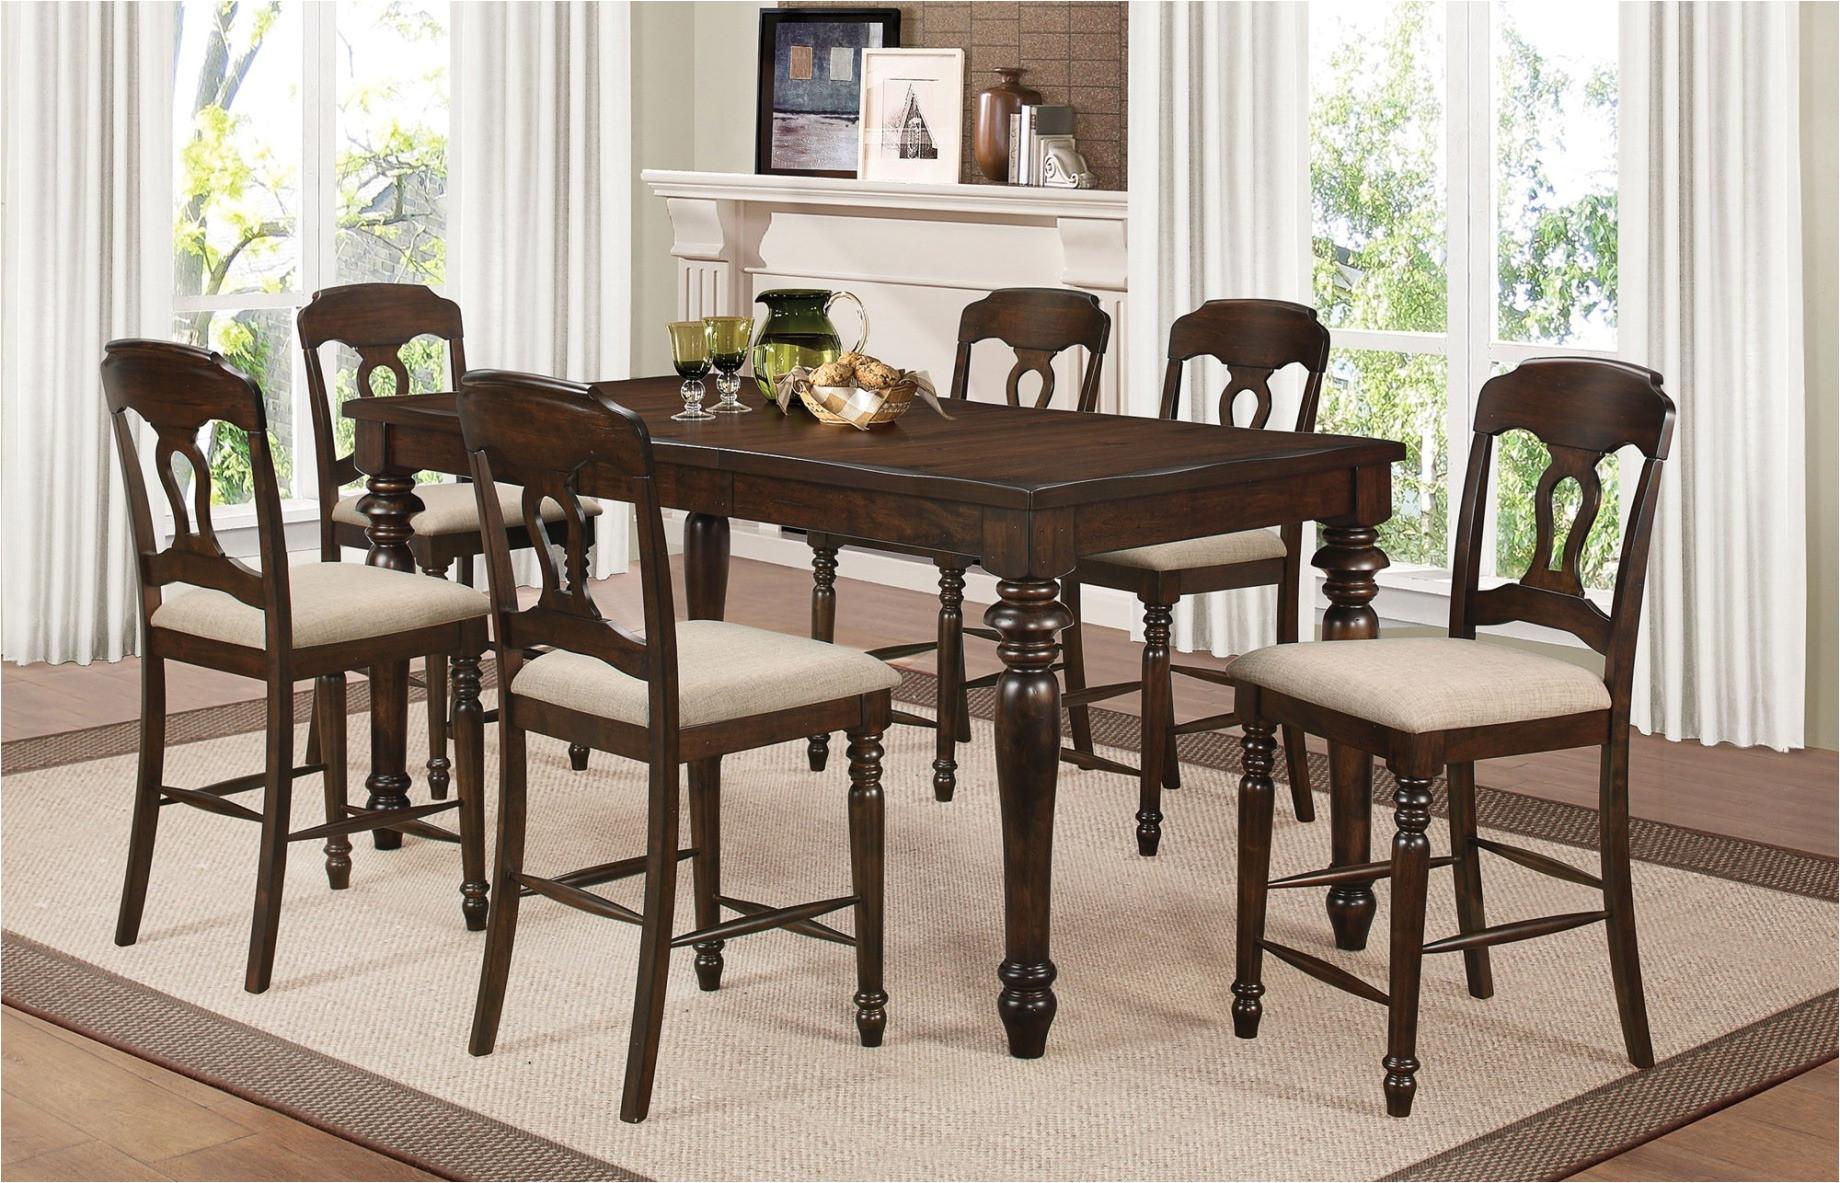 large designer coffee tables coffee table big lots artistic decor also bright biglots desk 0d ova